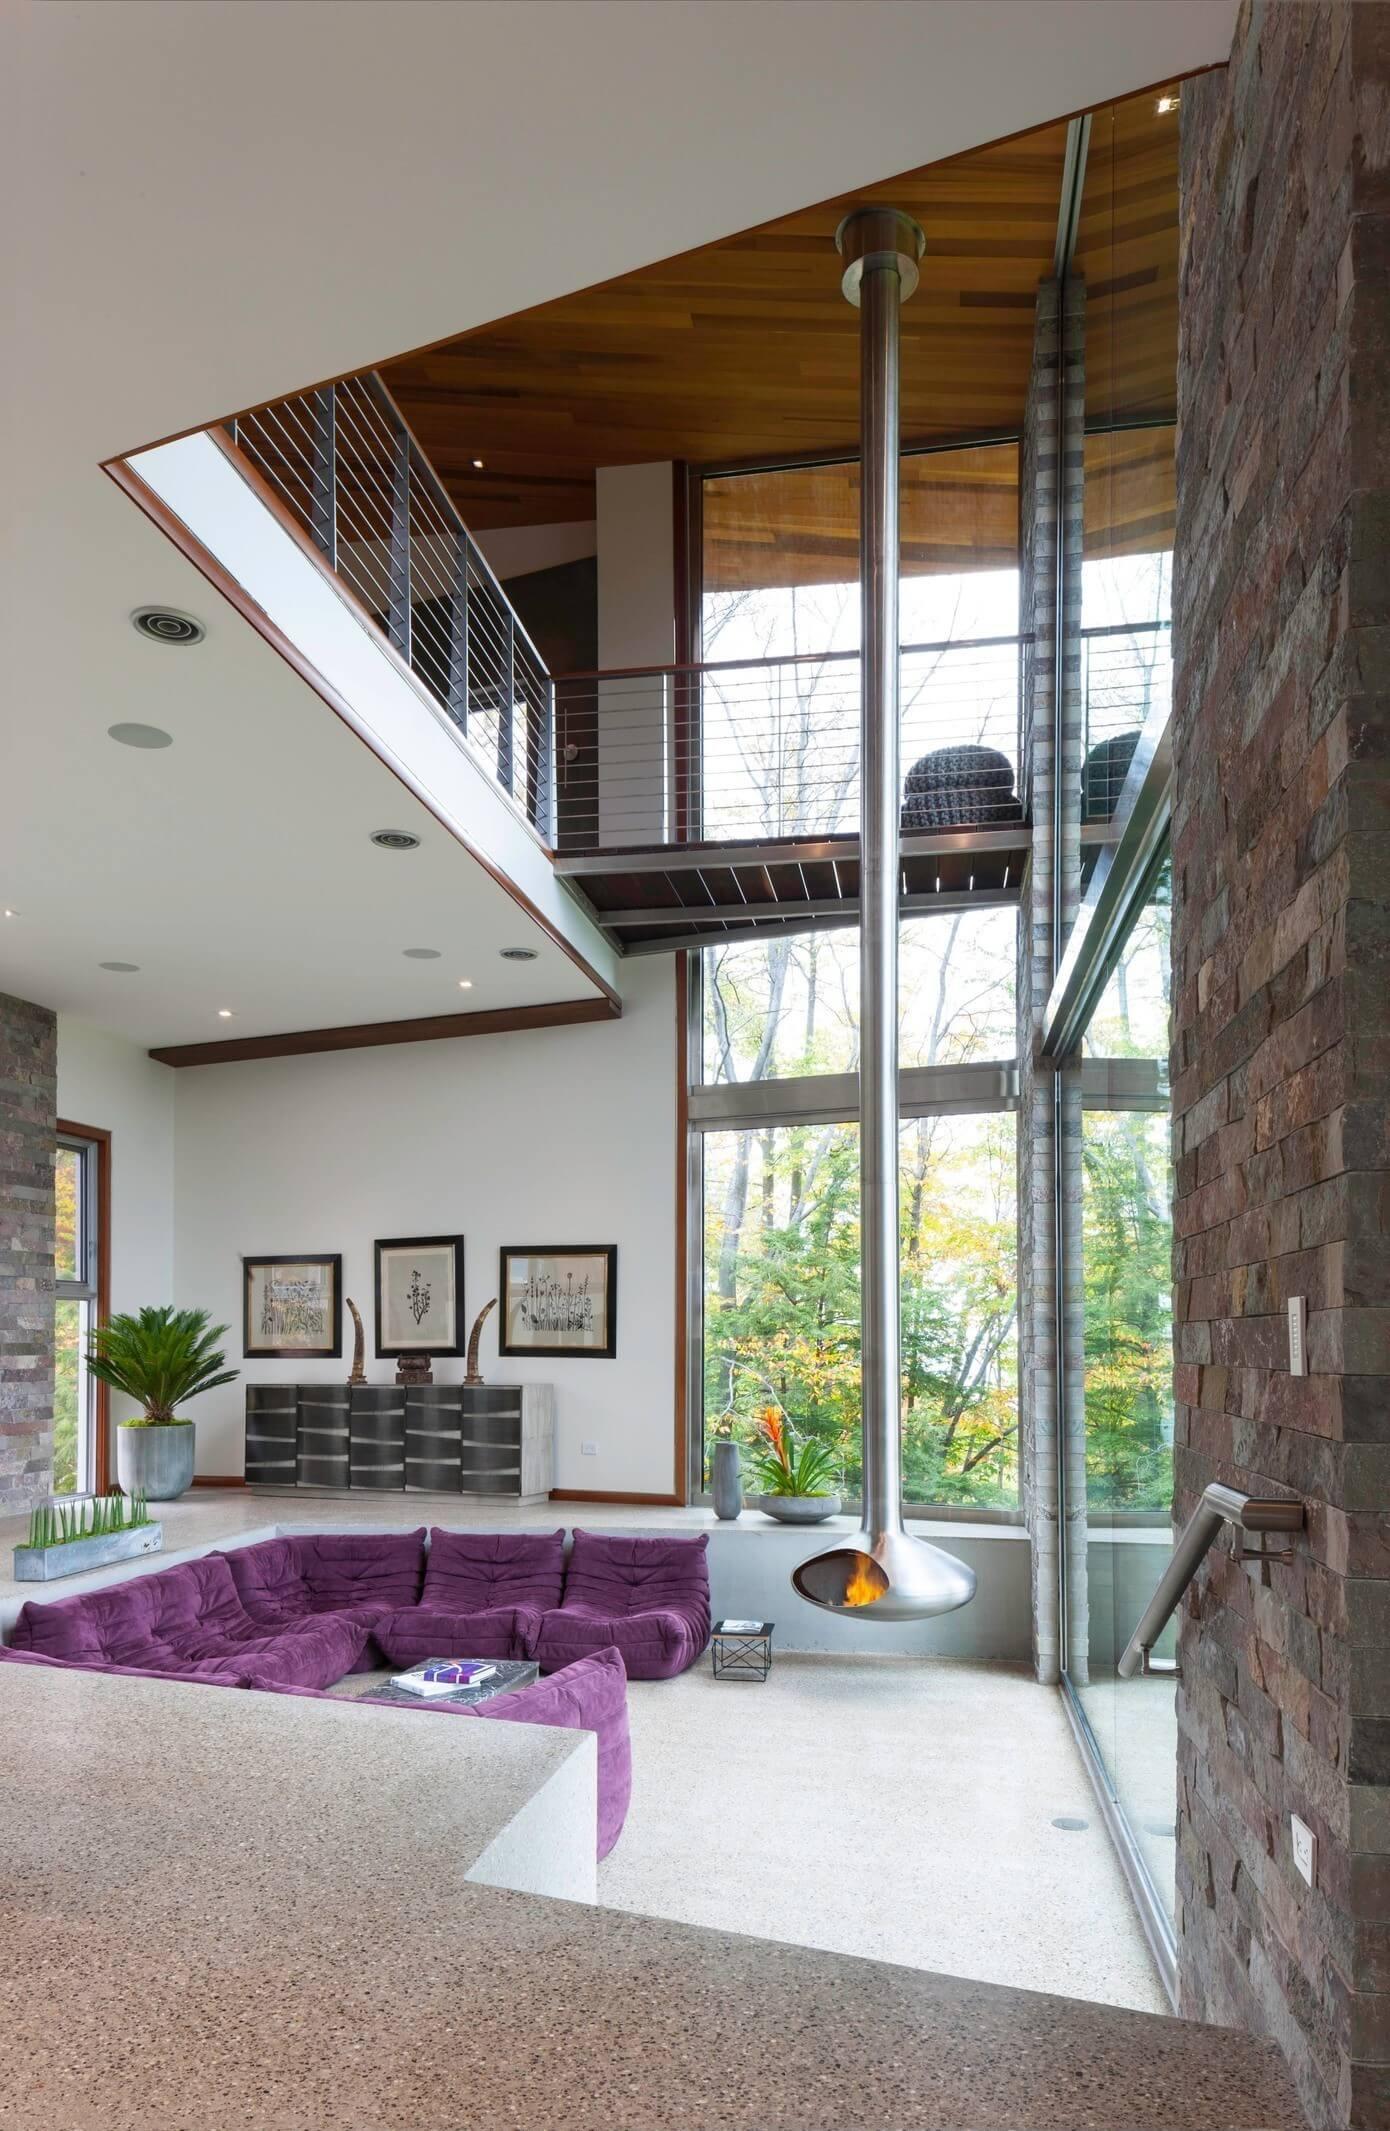 M-22 House by Michael Fitzhugh